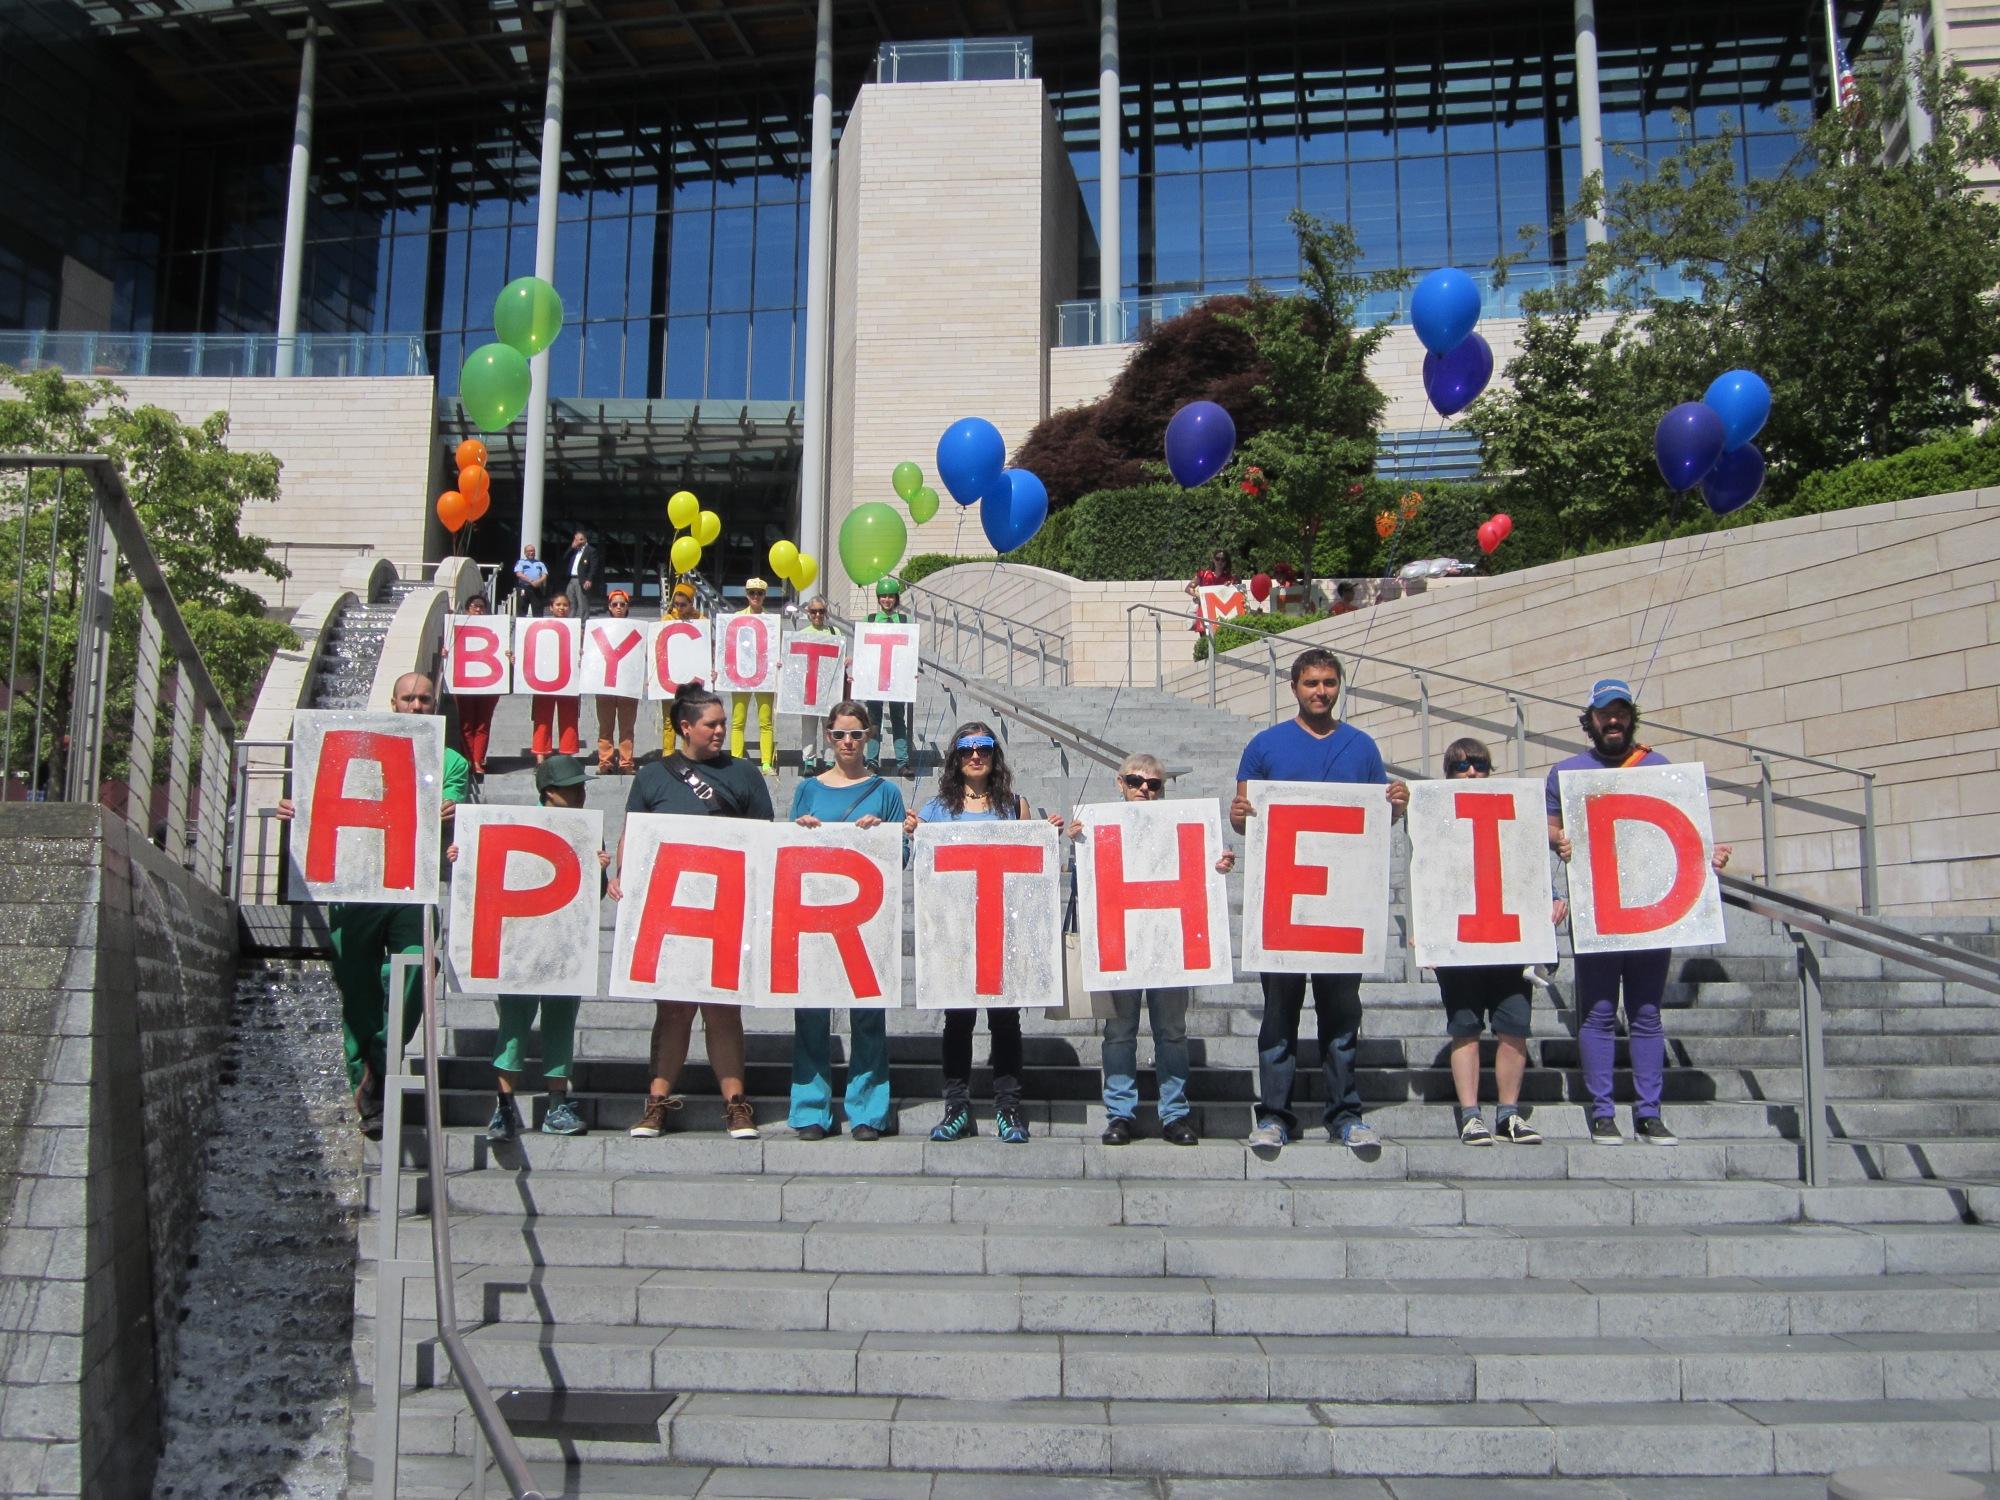 boycott apartheid on city steps